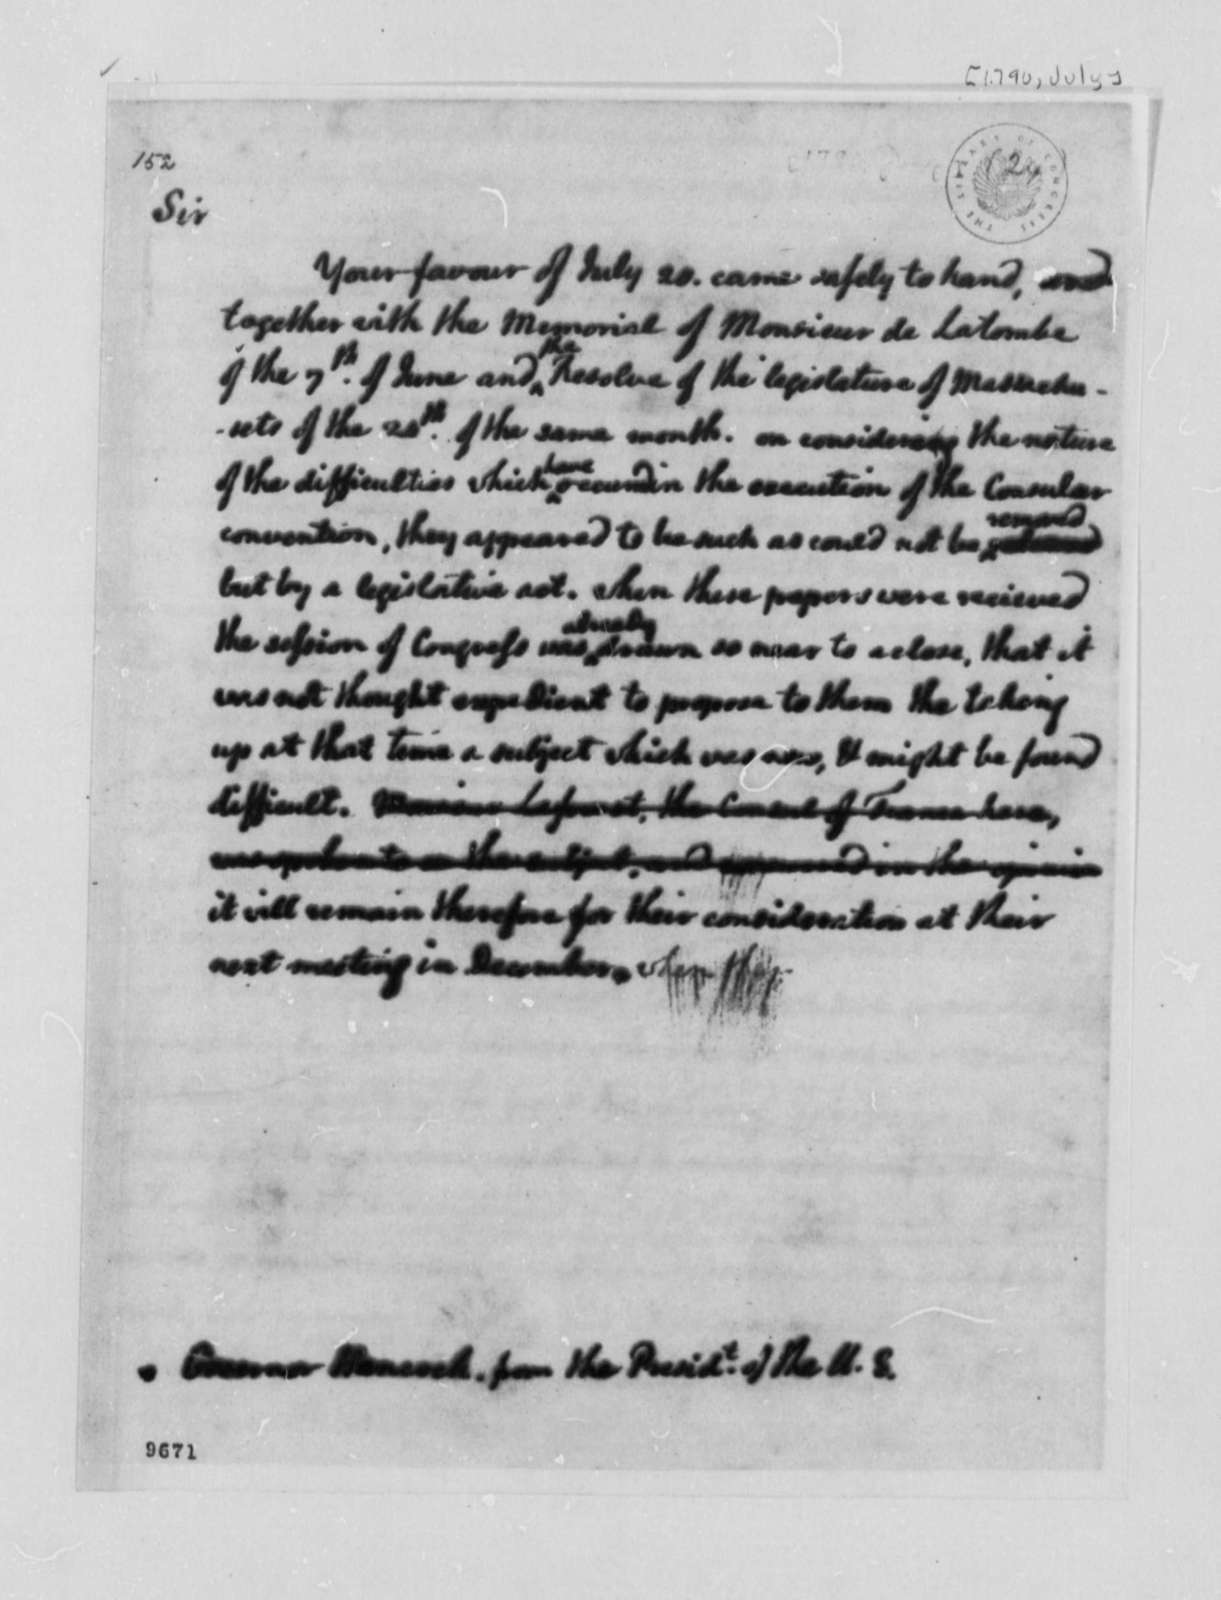 George Washington to John Hancock, July 1790